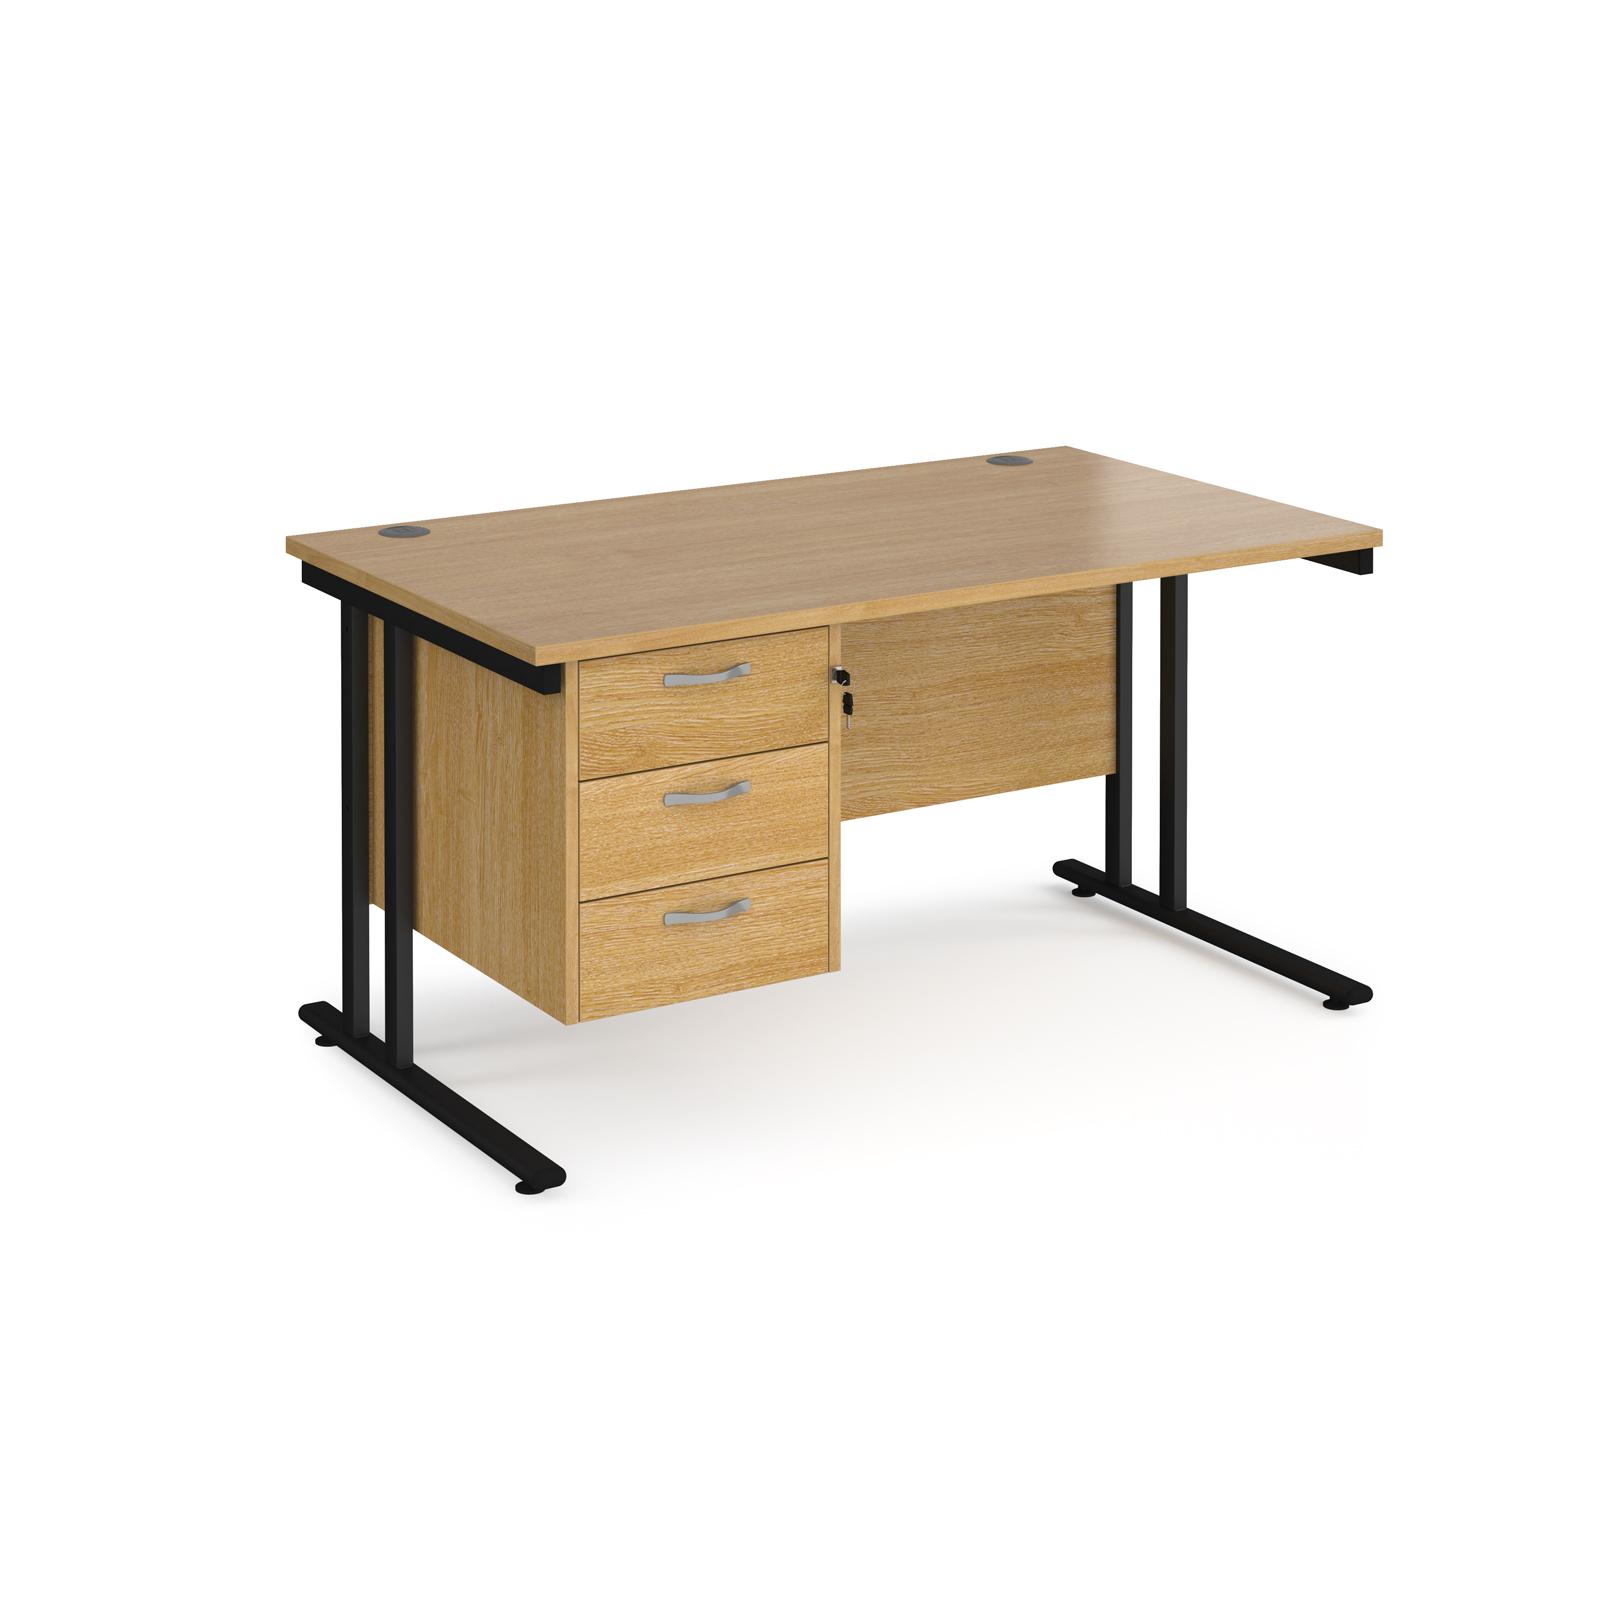 Rectangular Desks Maestro 25 straight desk 1400mm x 800mm with 3 drawer pedestal - black cantilever leg frame, oak top